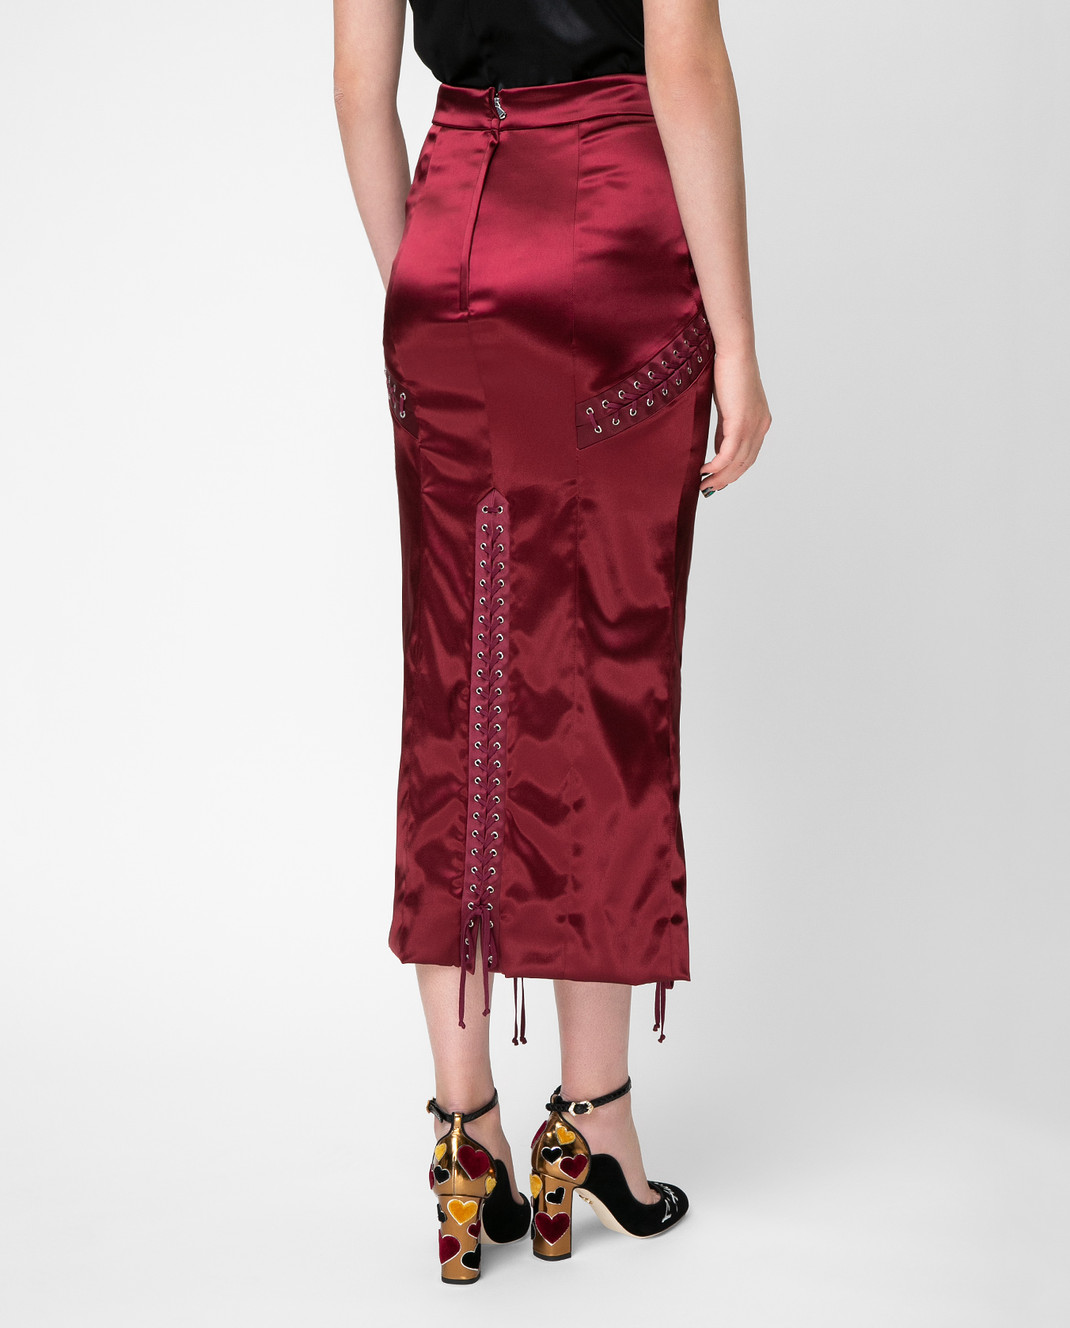 Dolce&Gabbana Красная юбка F4BCNTFURAD изображение 4